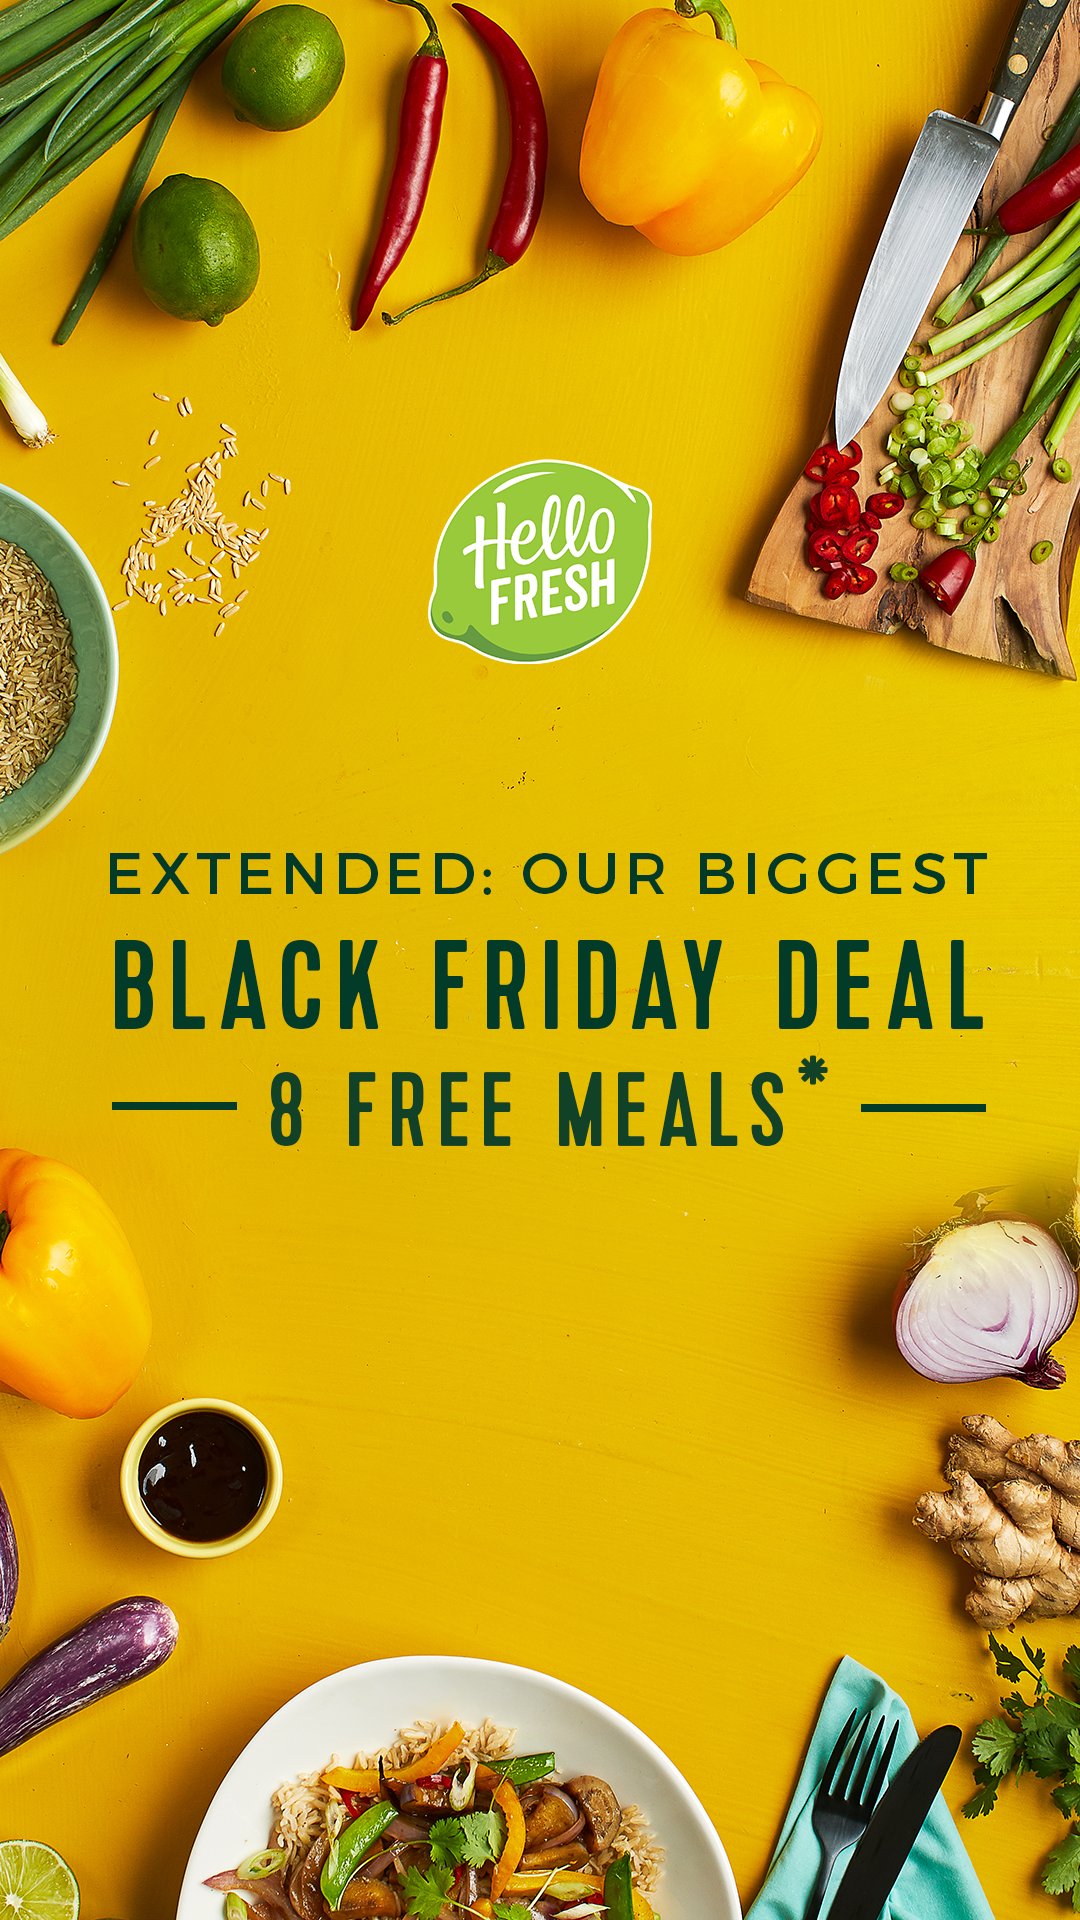 Hellofresh Black Friday Deal